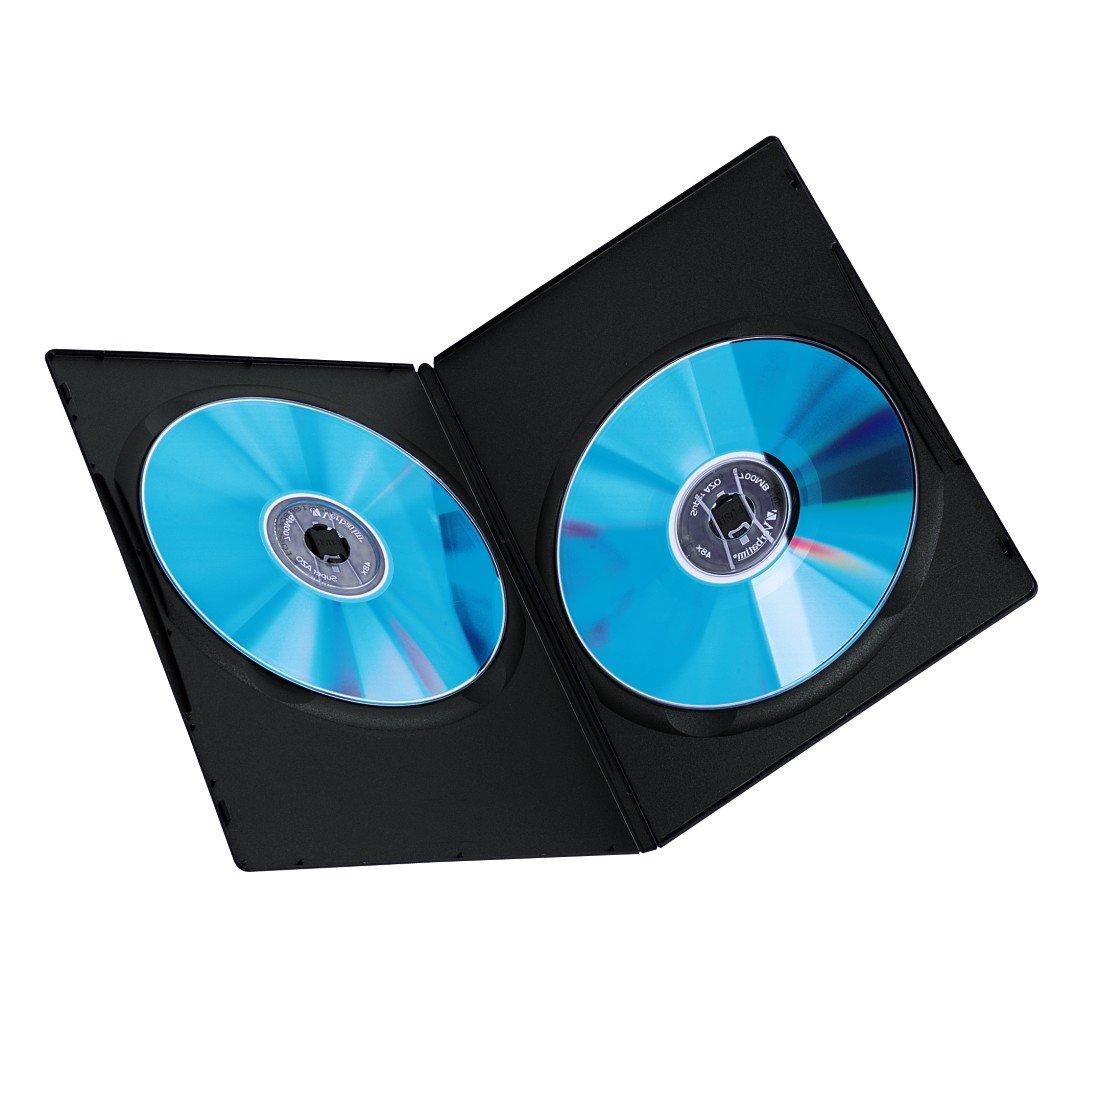 Hama 51185 - Carcasa para DVD (25 Unidades), Negro: Amazon.es: Informática